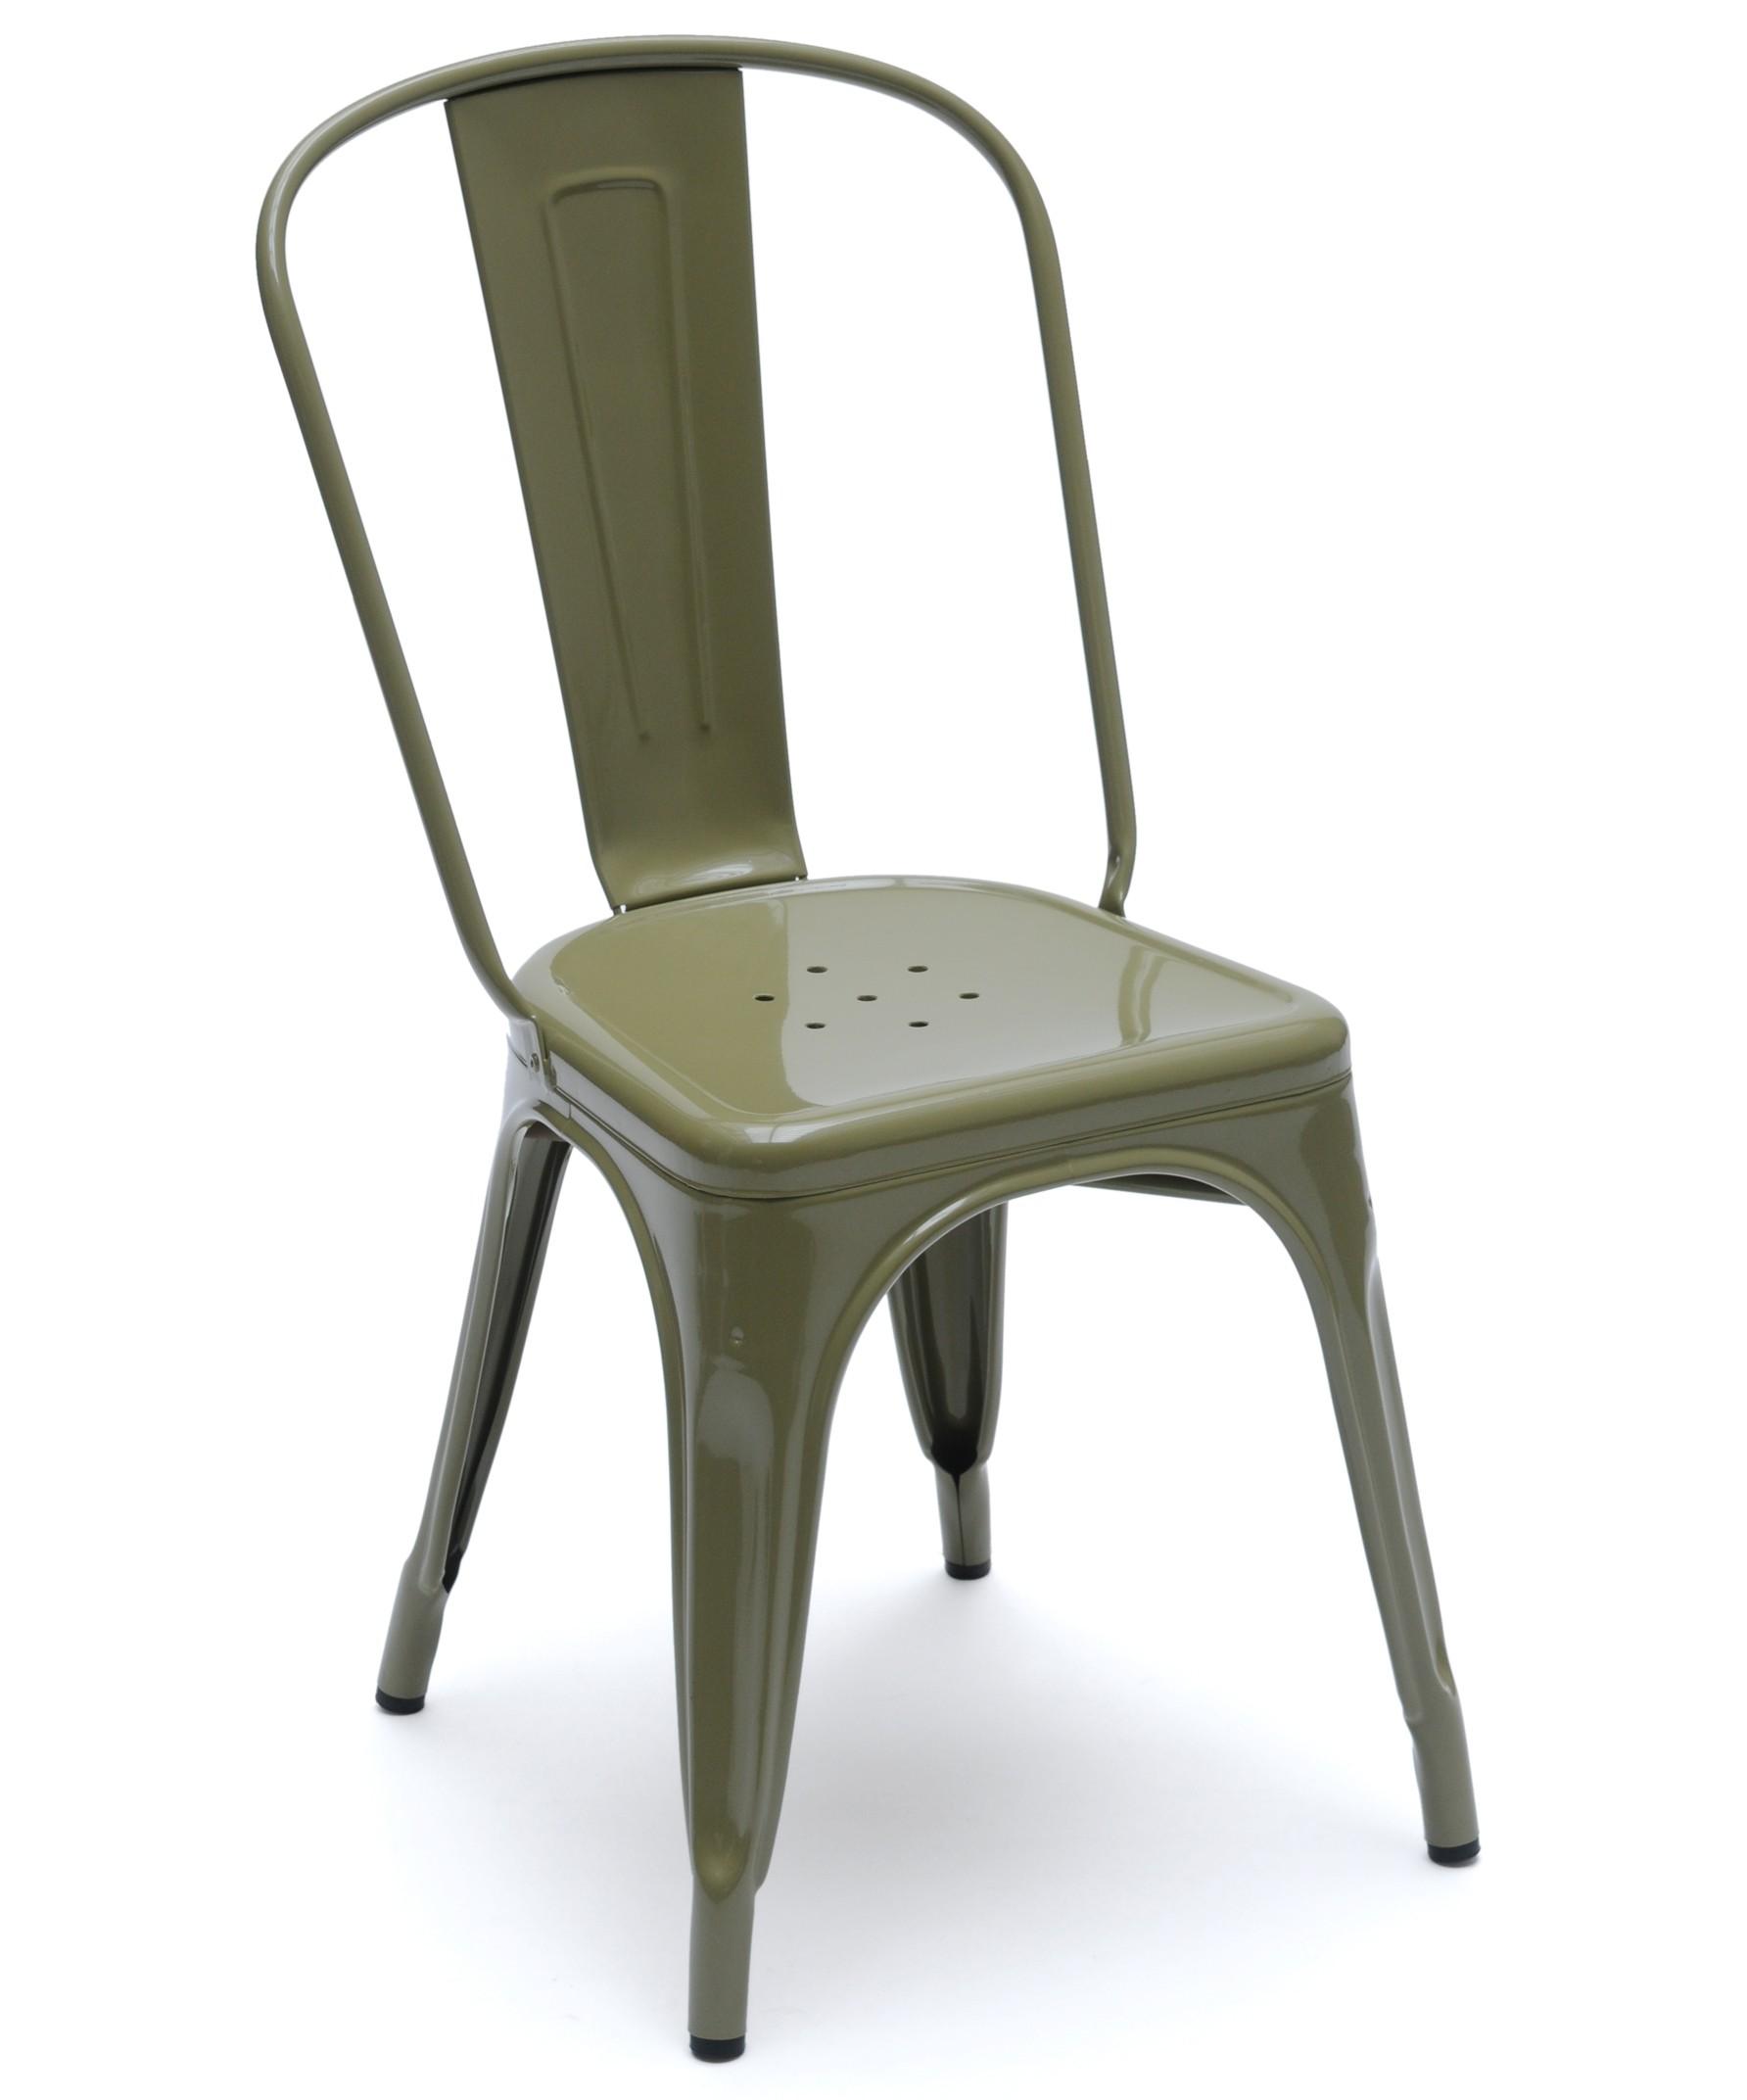 chaise a de tolix acier laqu 8 coloris. Black Bedroom Furniture Sets. Home Design Ideas